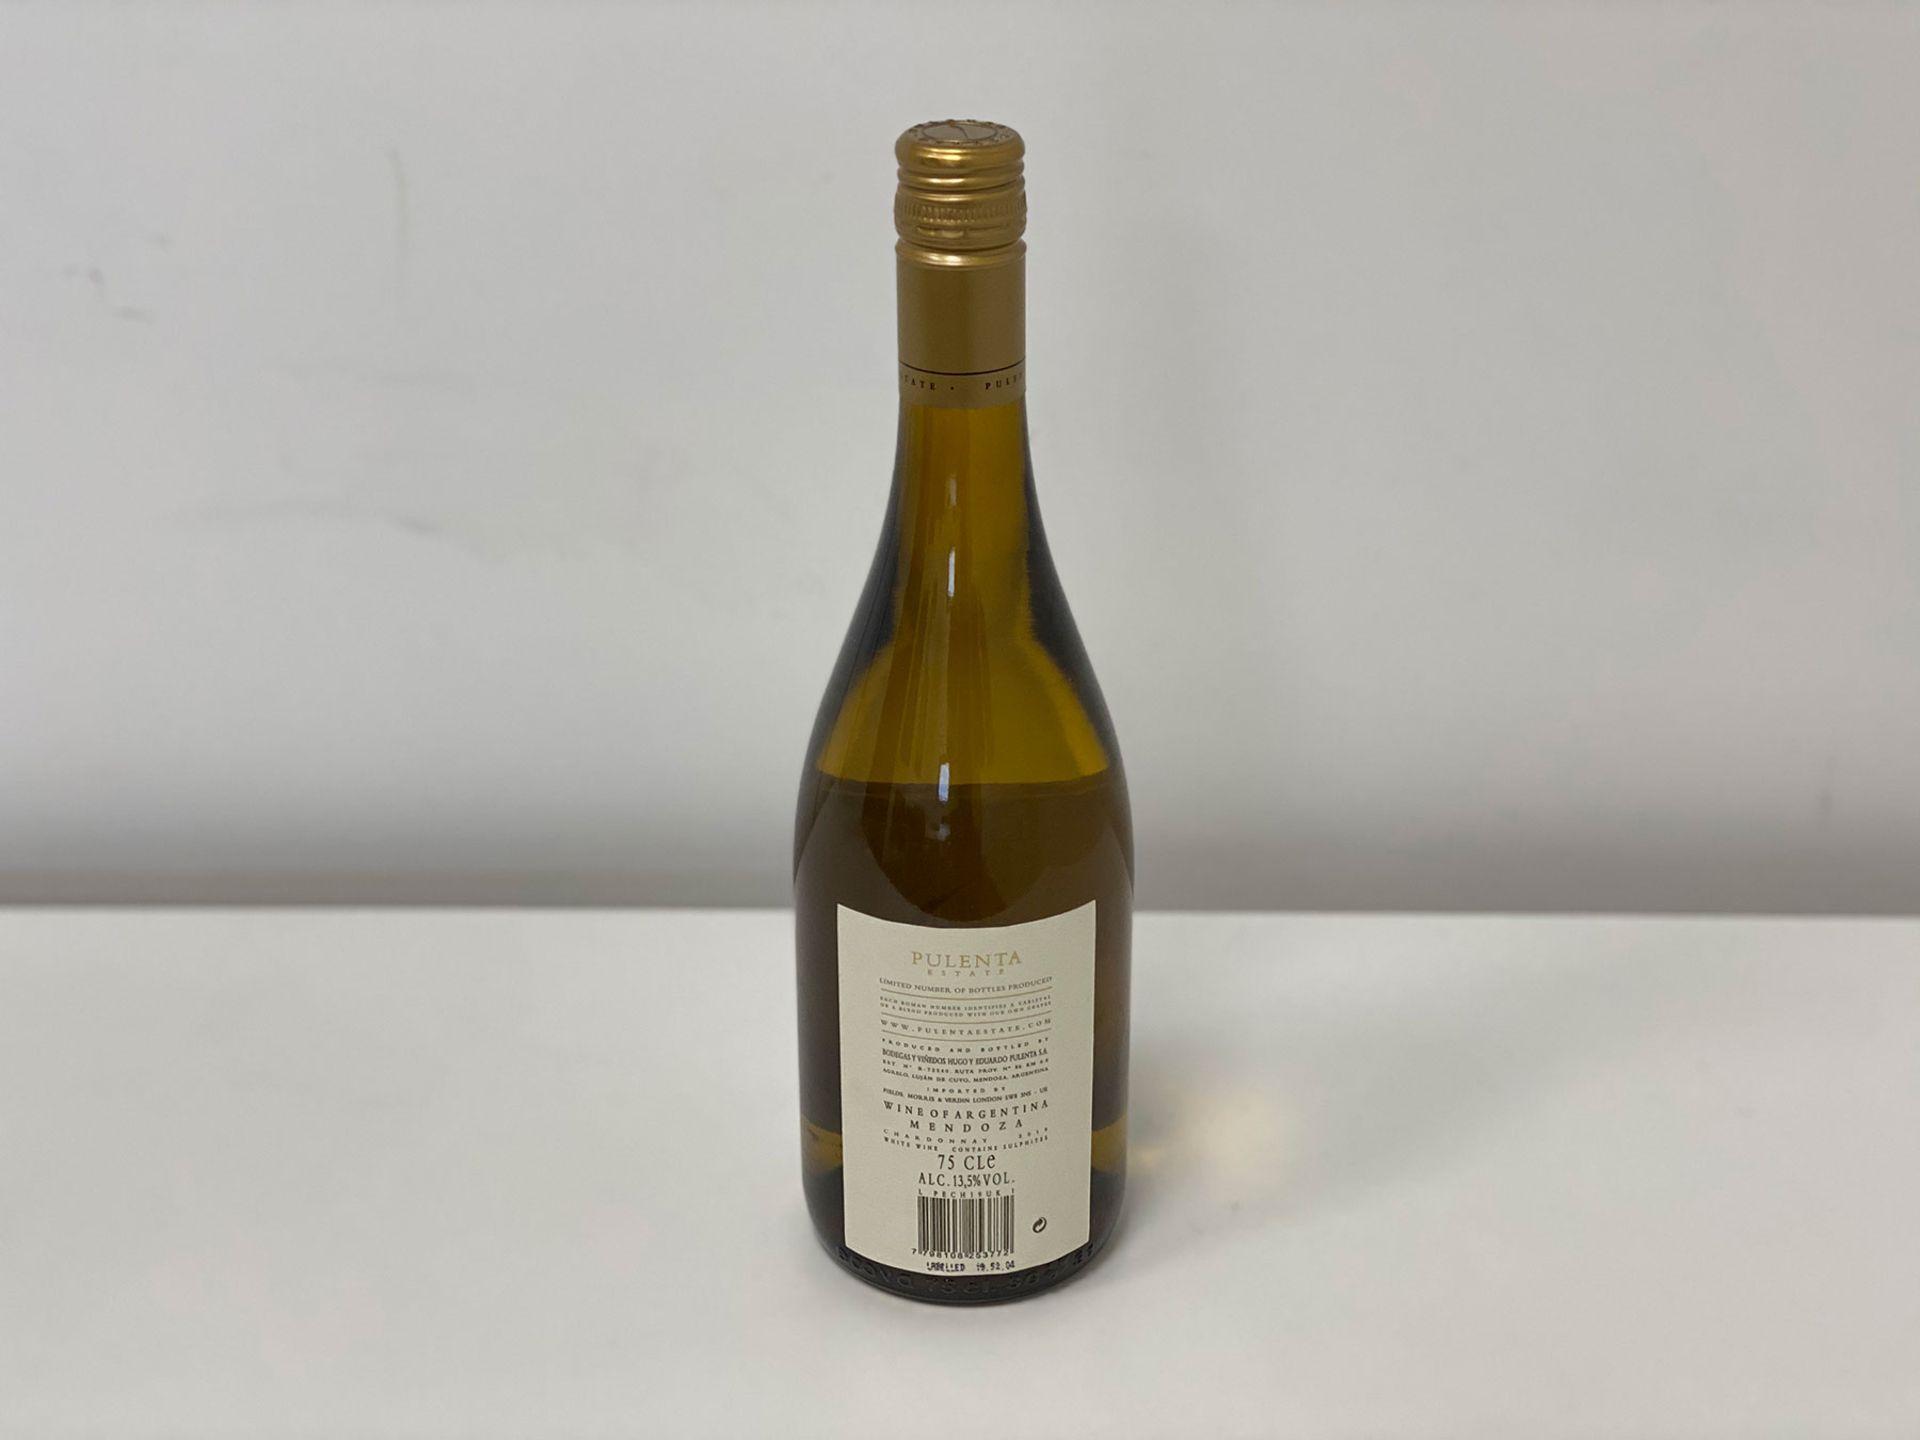 6 Bottles (1 Case) 2019 Pulenta Estate - Pulenta Estate - Chardonnay - Mendoza - Image 2 of 2